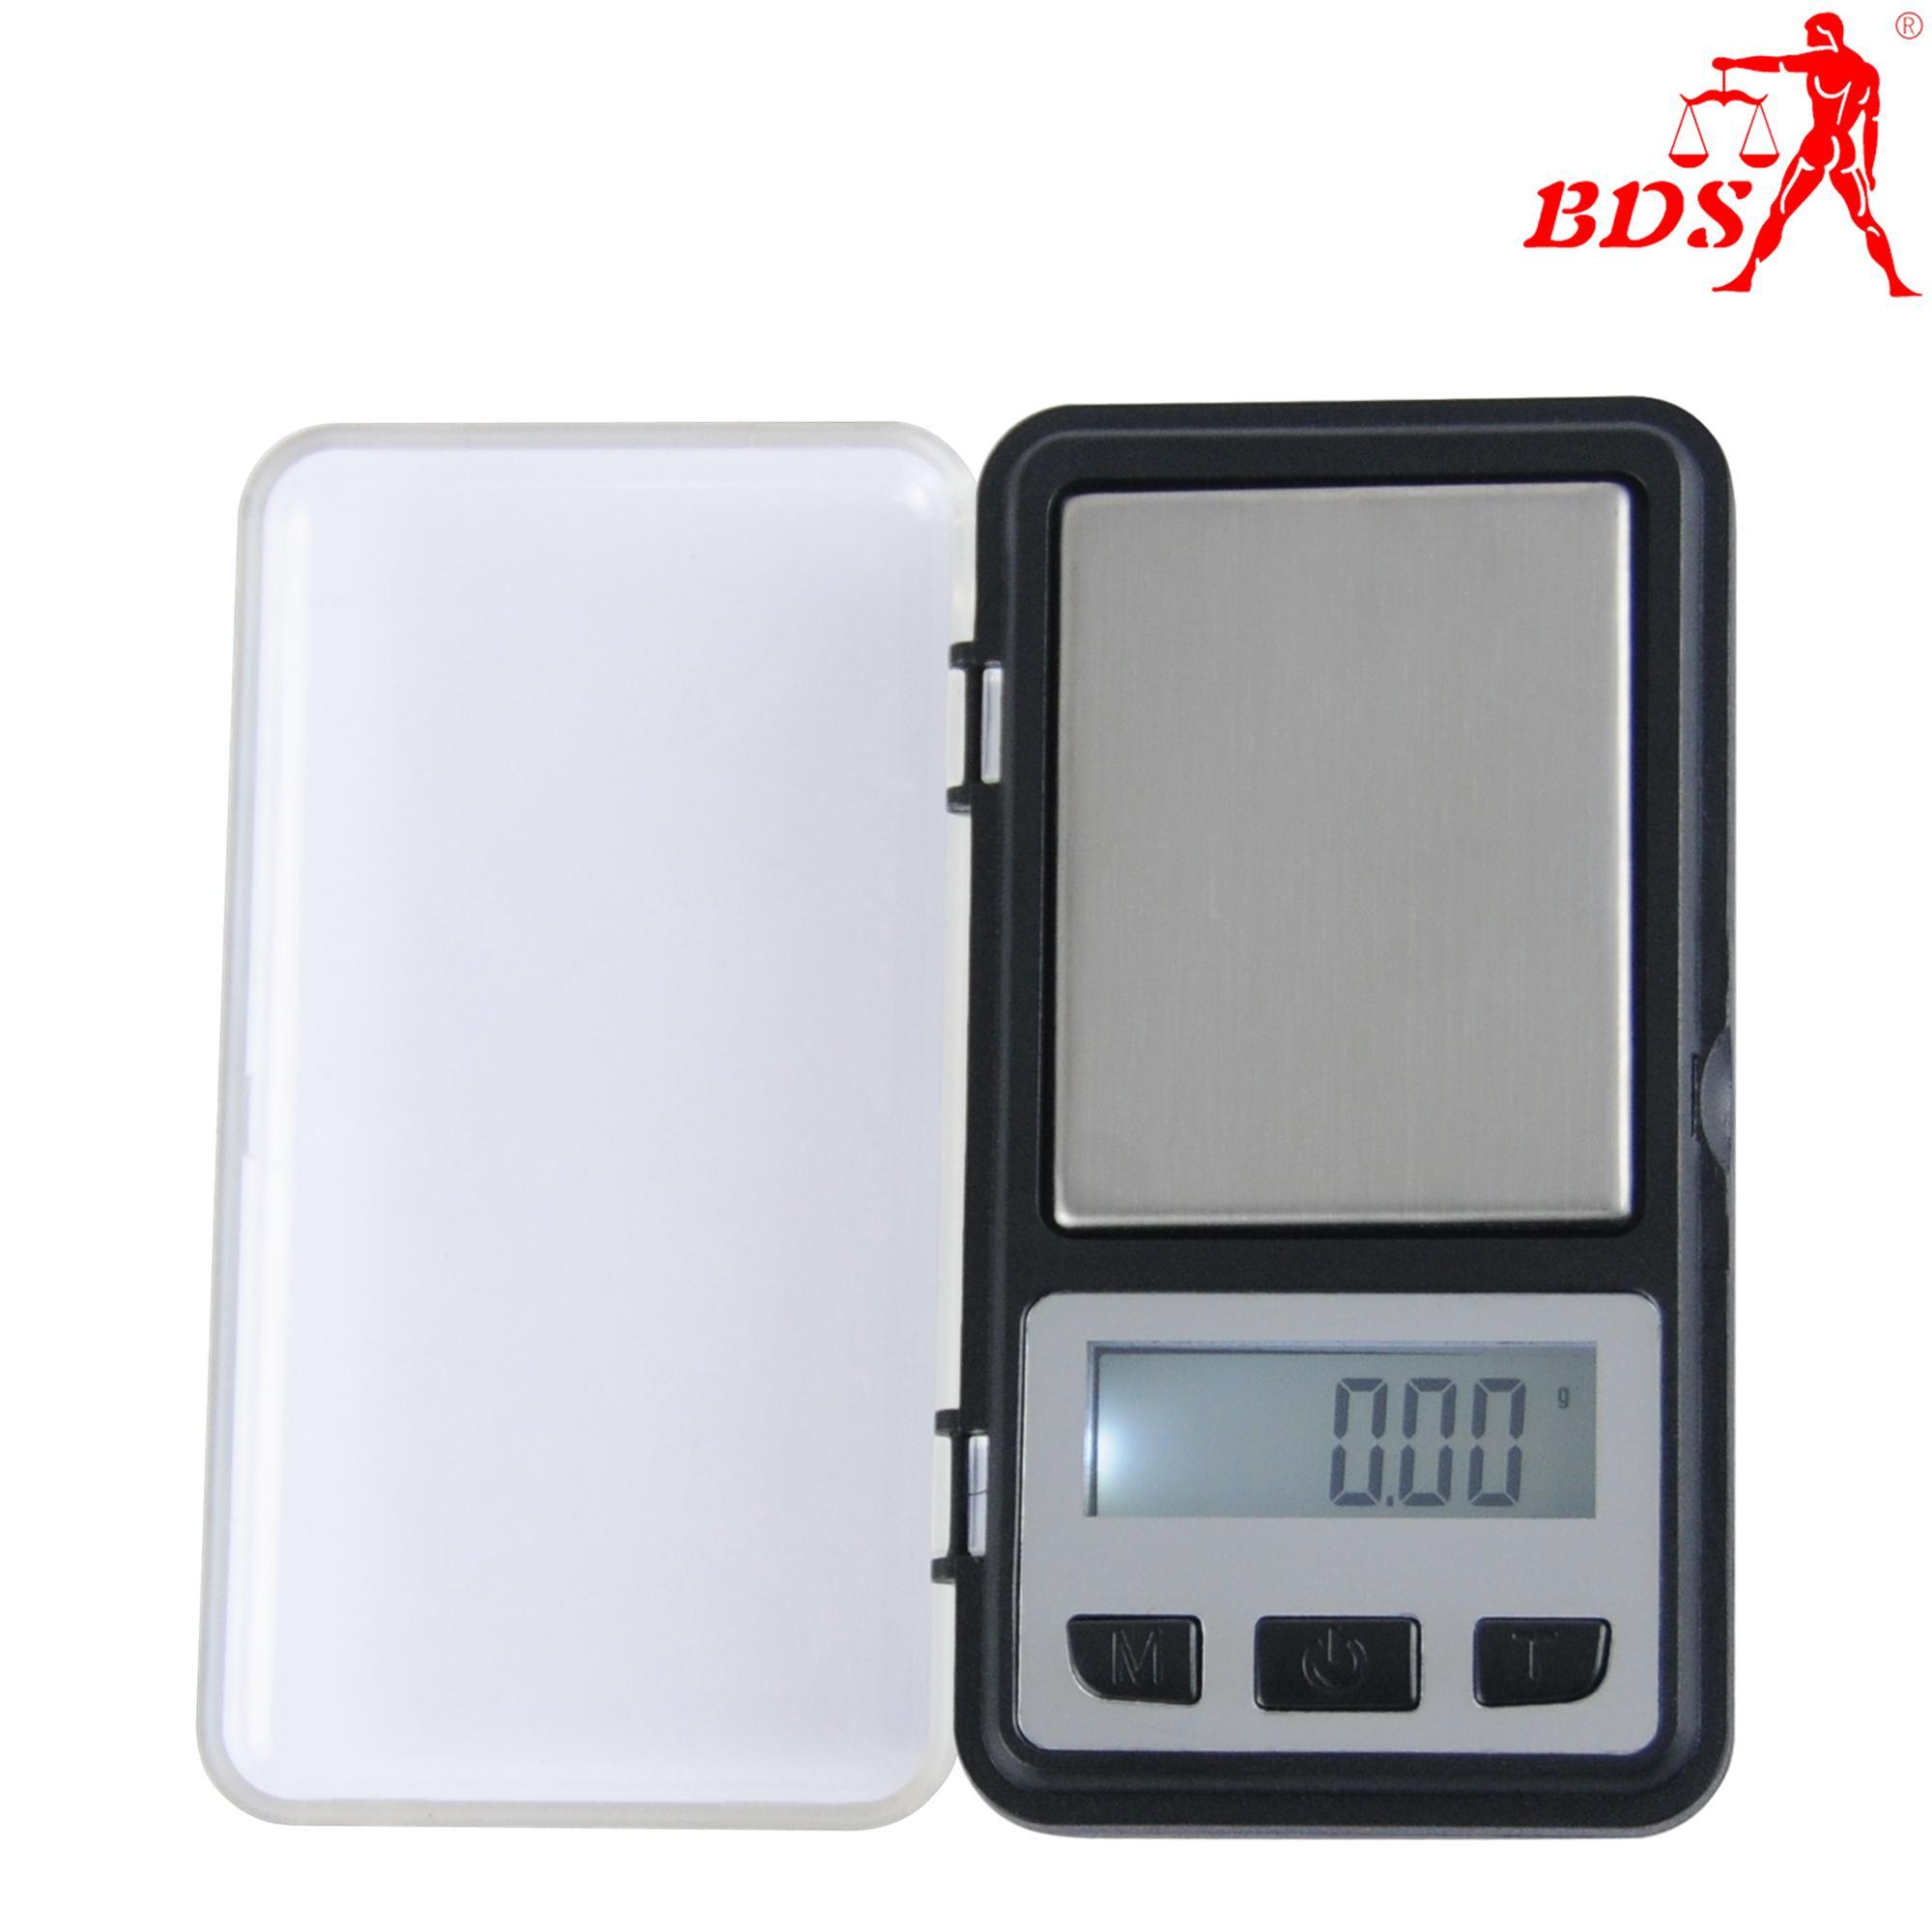 BDS6010便攜式電子口袋珠寶秤 1